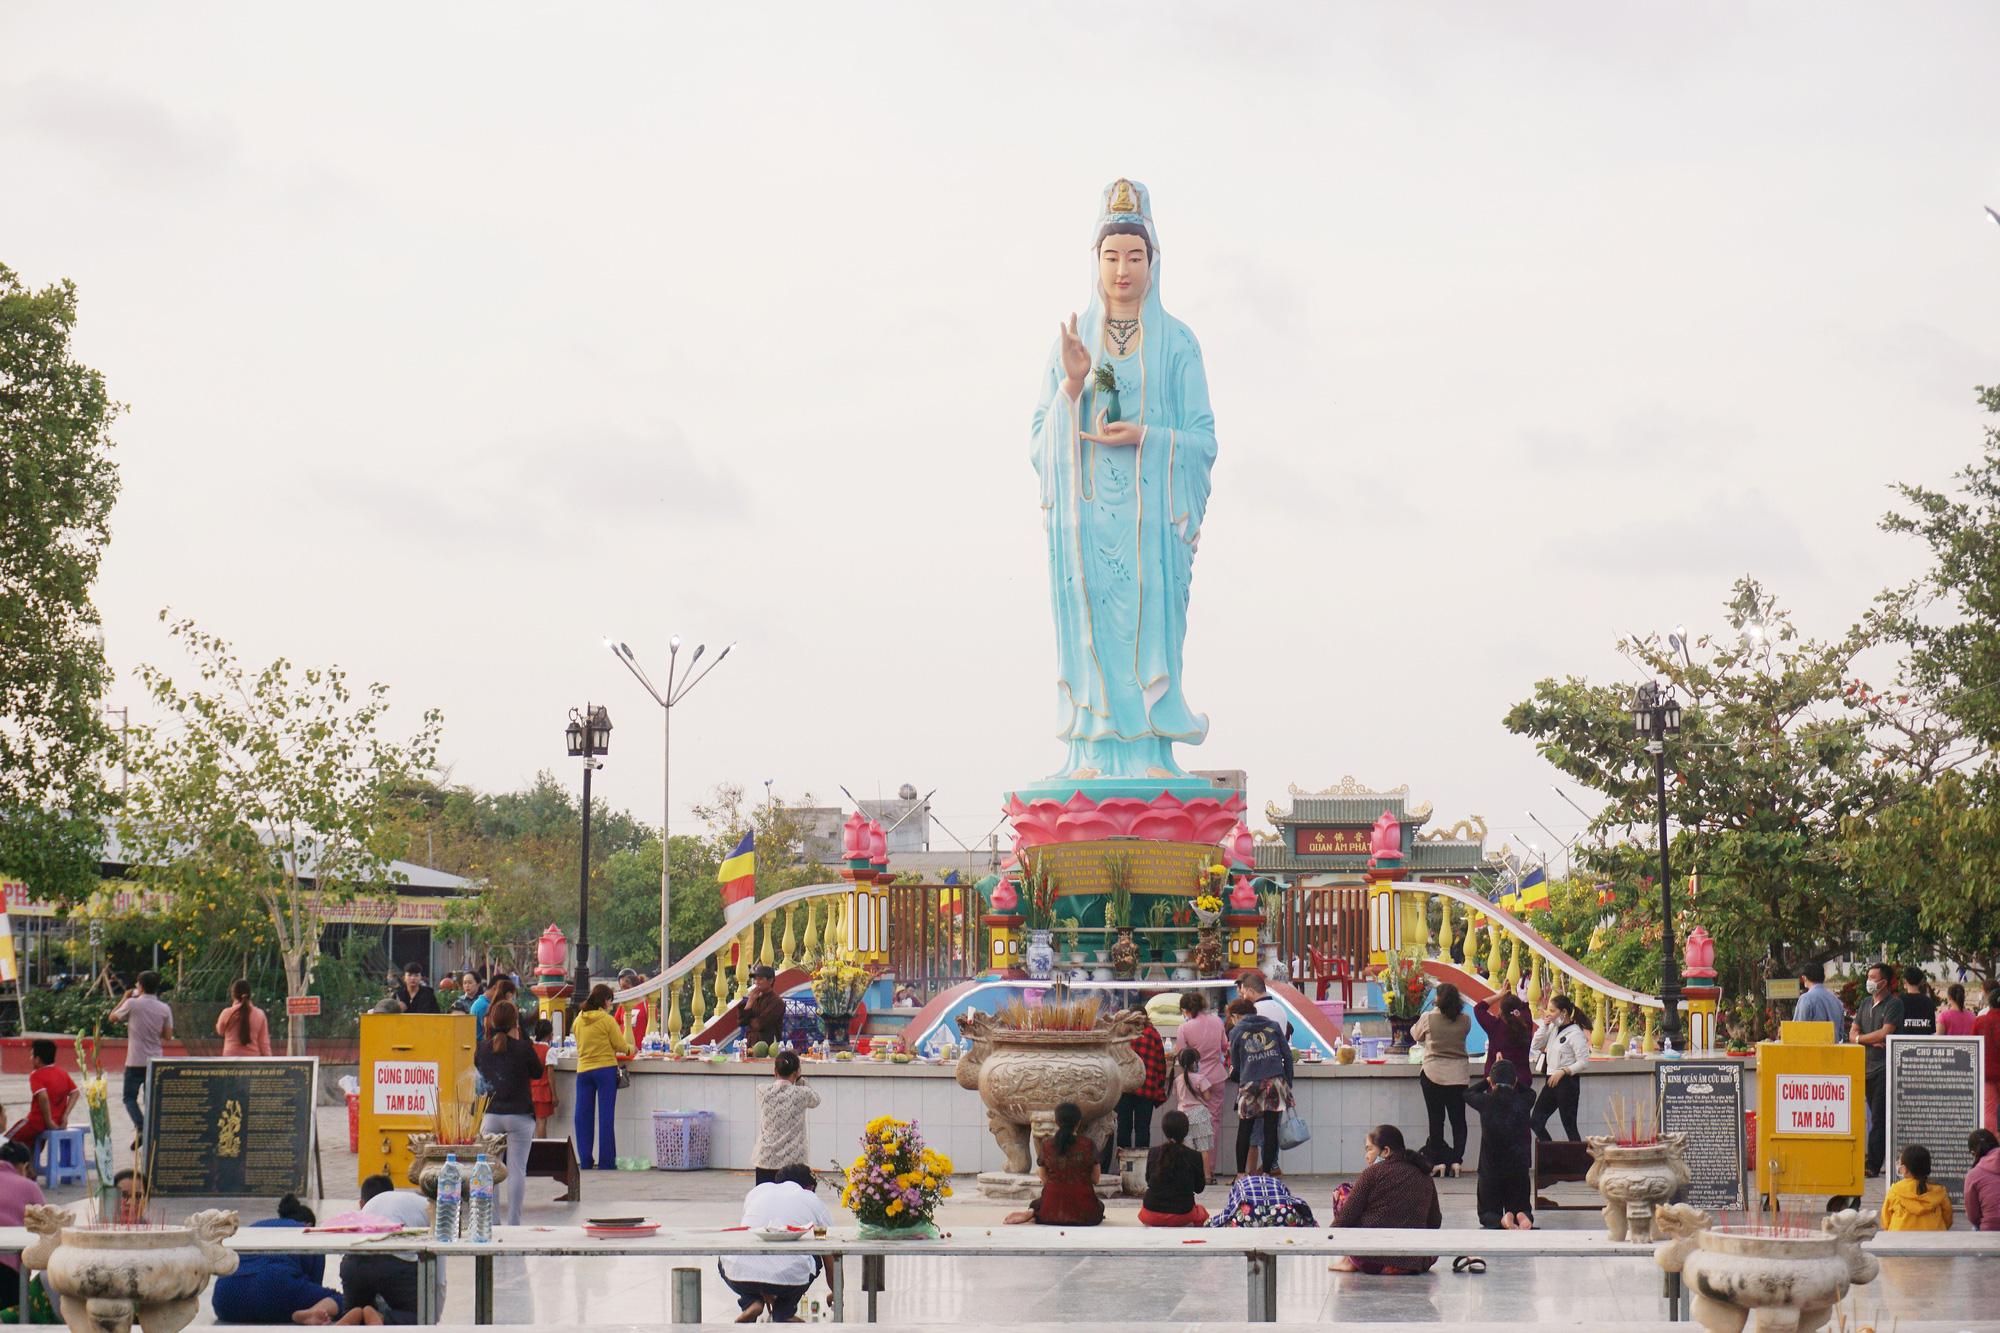 Quan Am Phat Dai Buddhist Temple, located in Nha Mat Ward, Bac Lieu City, Bac Lieu Province, Vietnam, is seen in the photo. Photo: Tuyet Kieu / Tuoi Tre